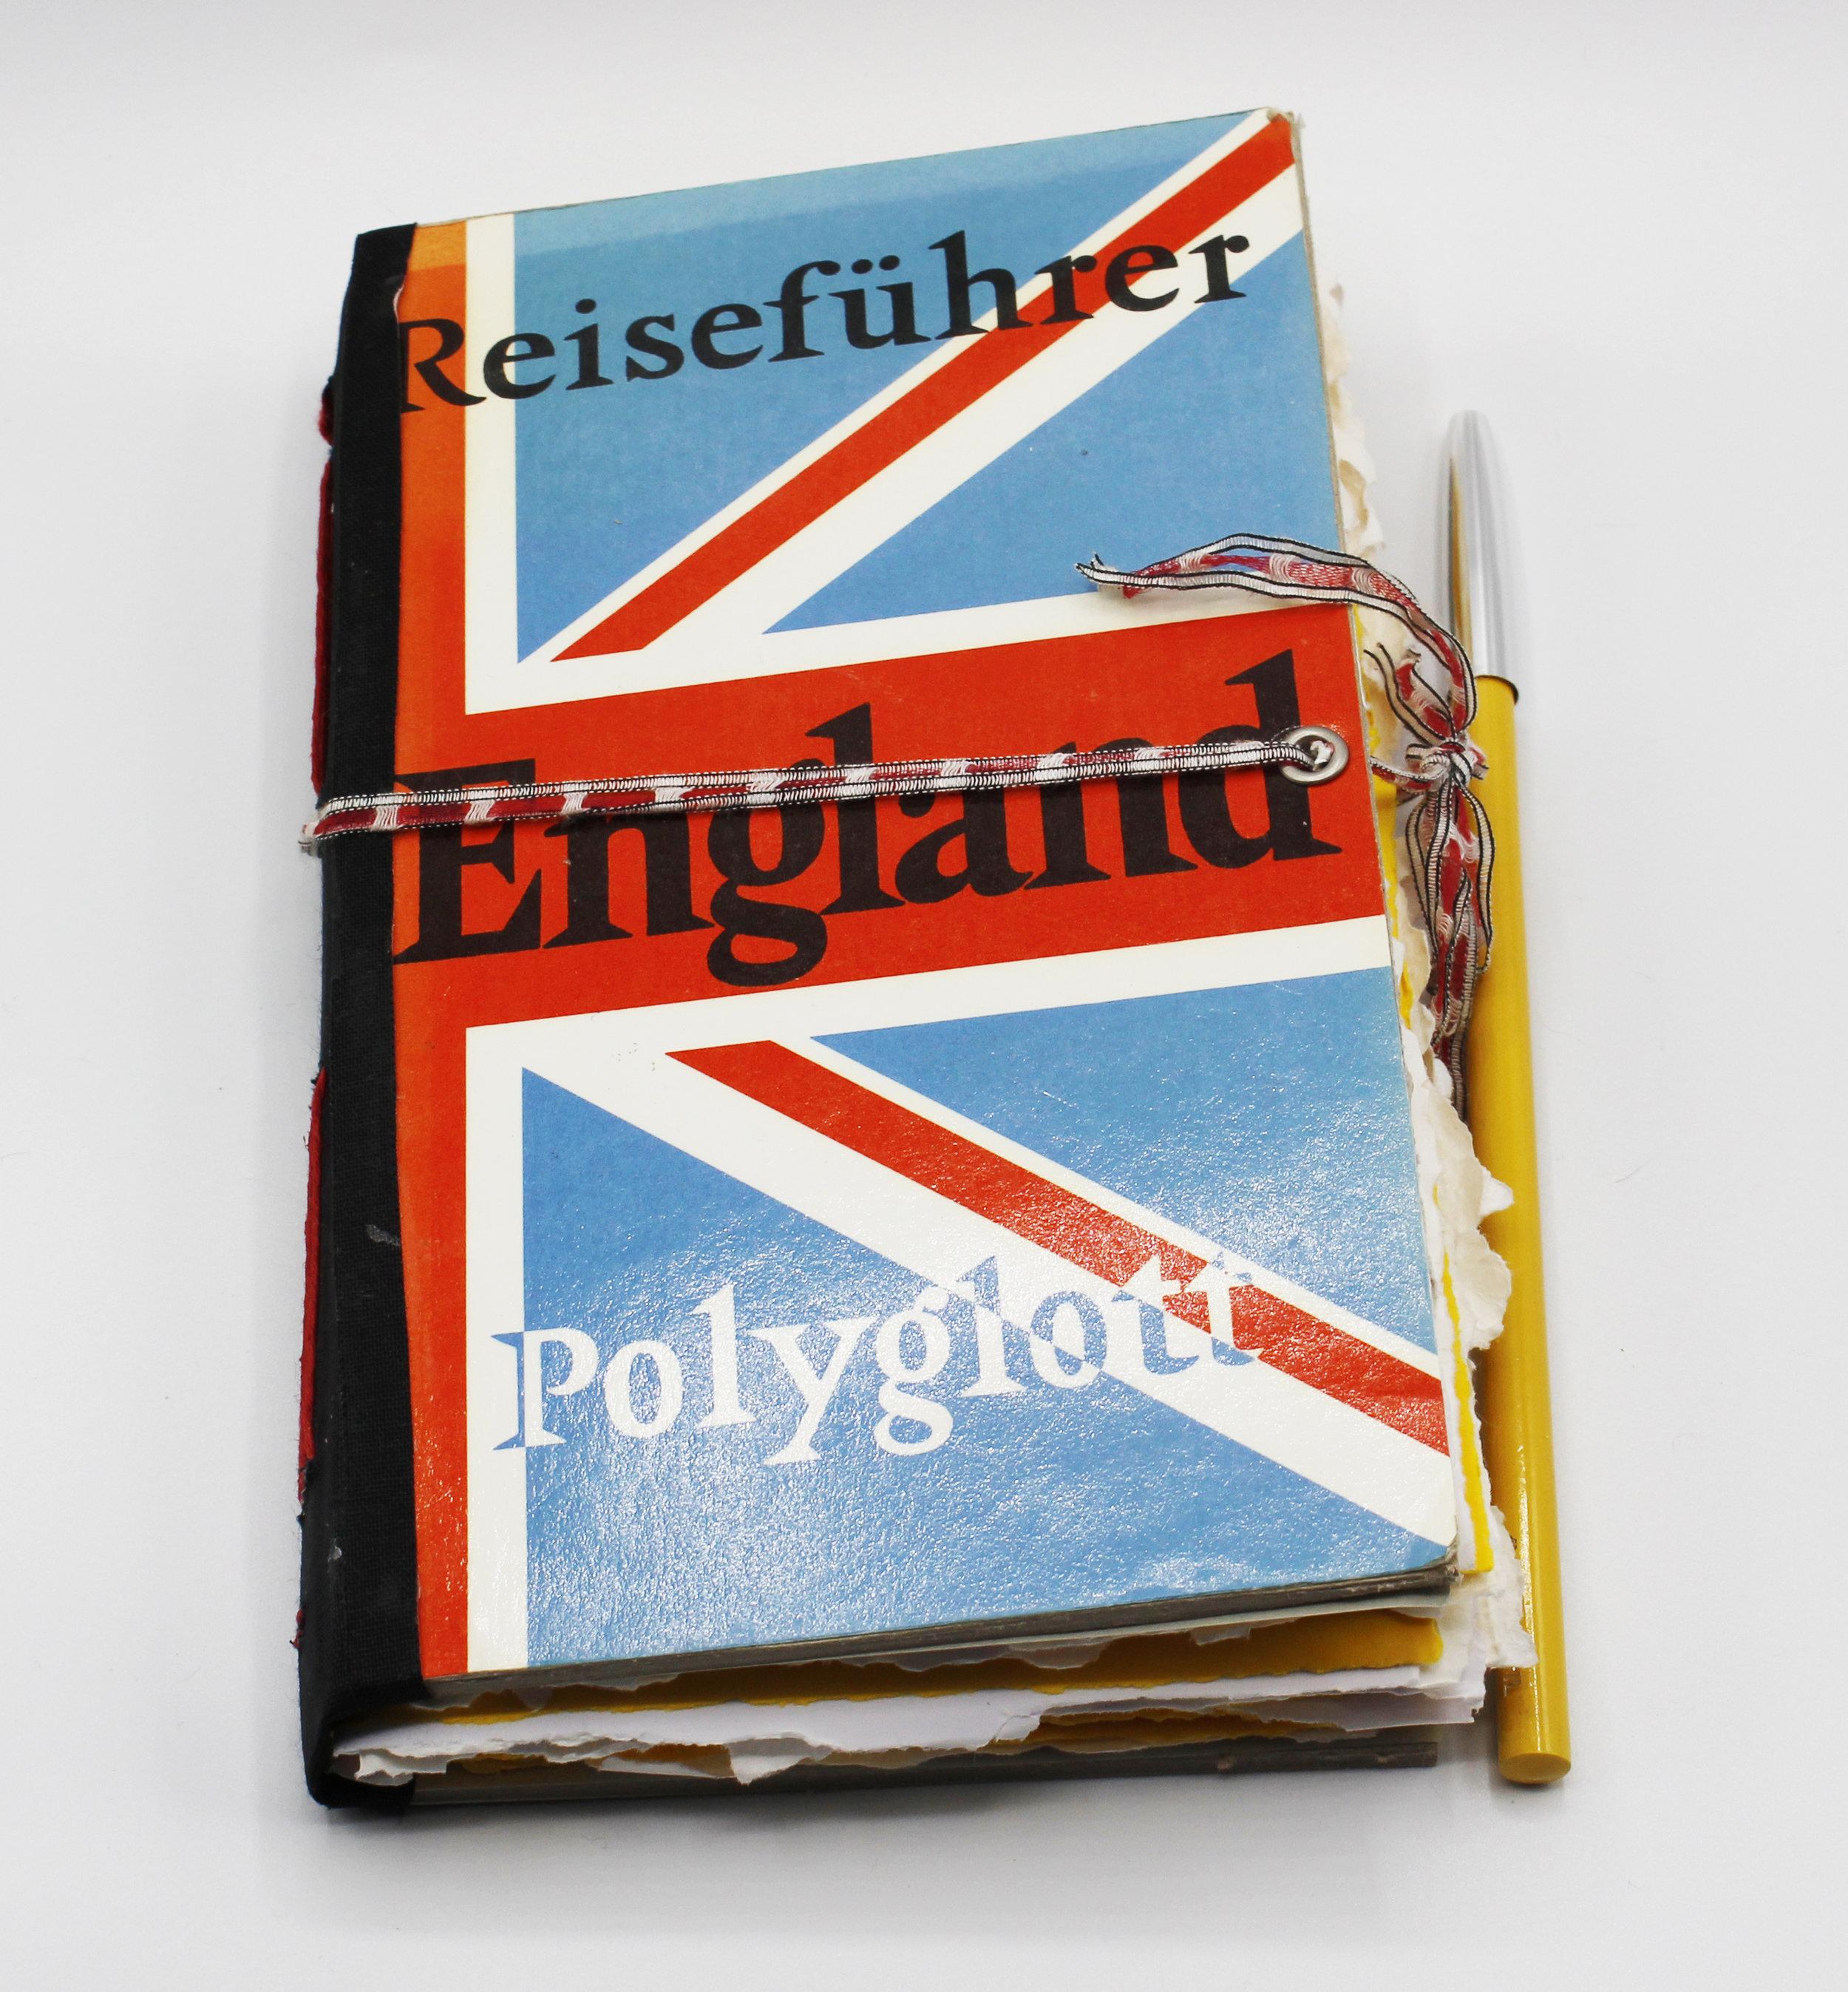 vintage-traravel_journal-England_1.JPG